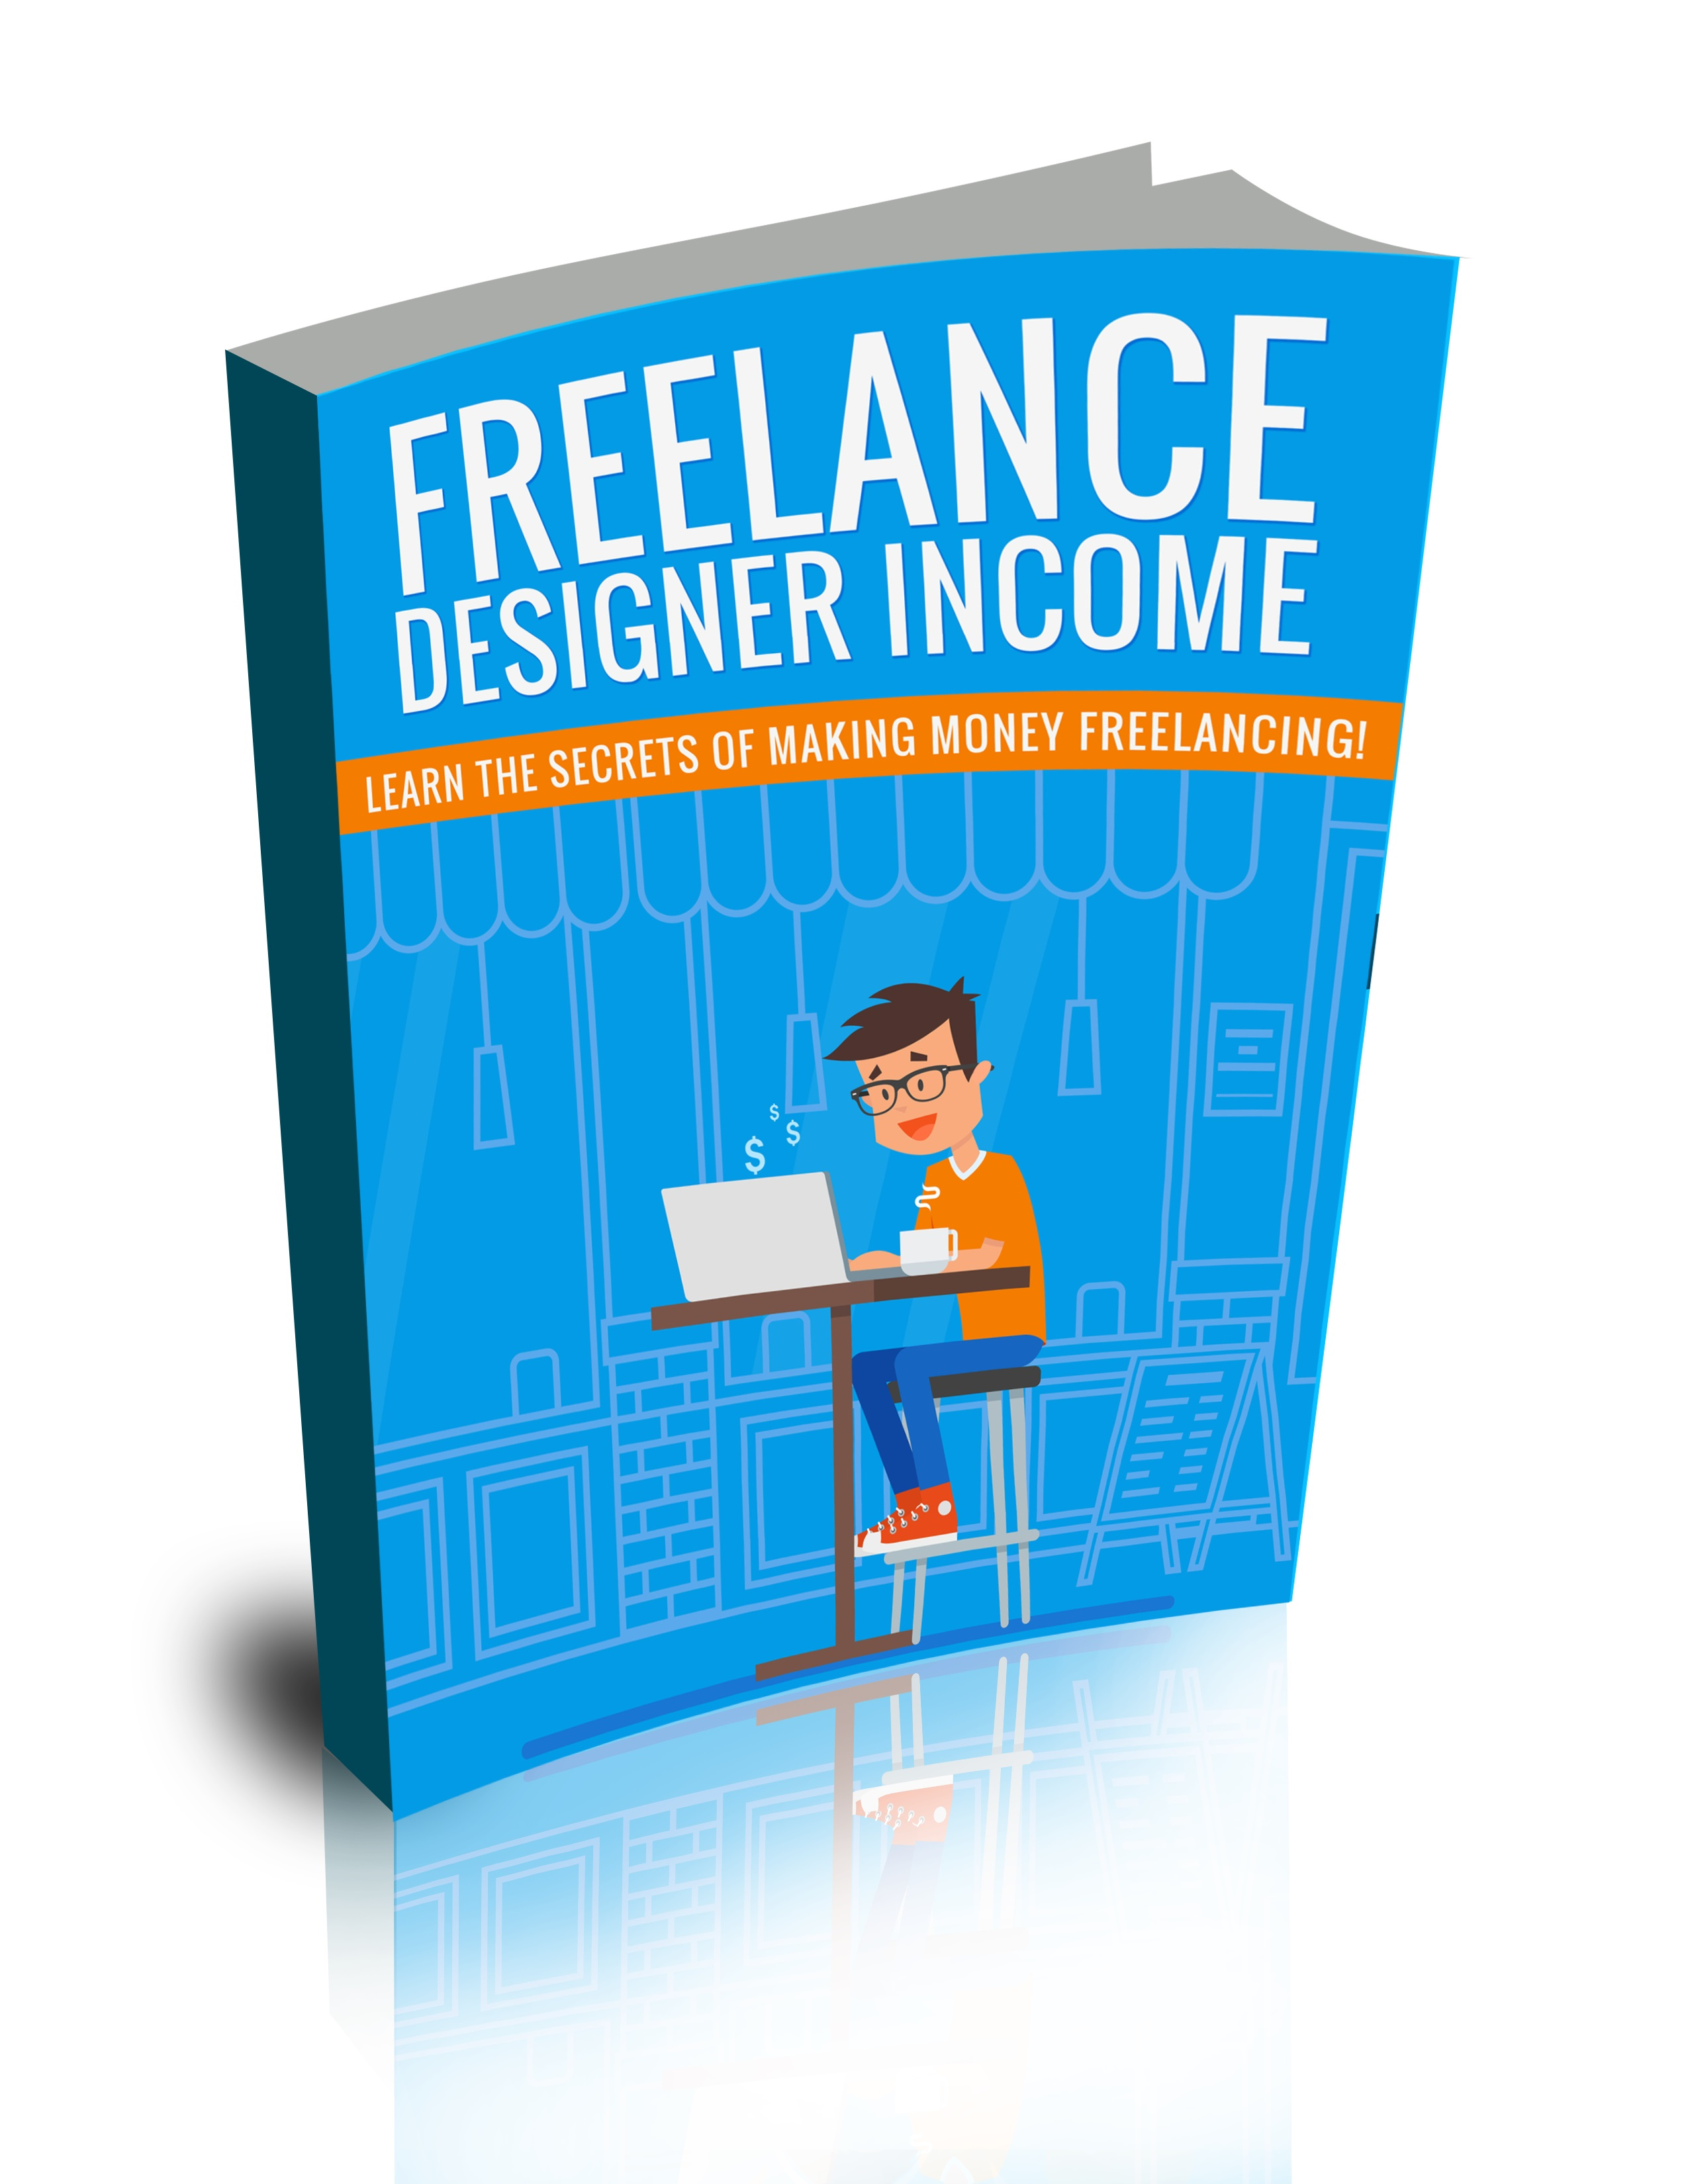 Freelance Designer Income Package